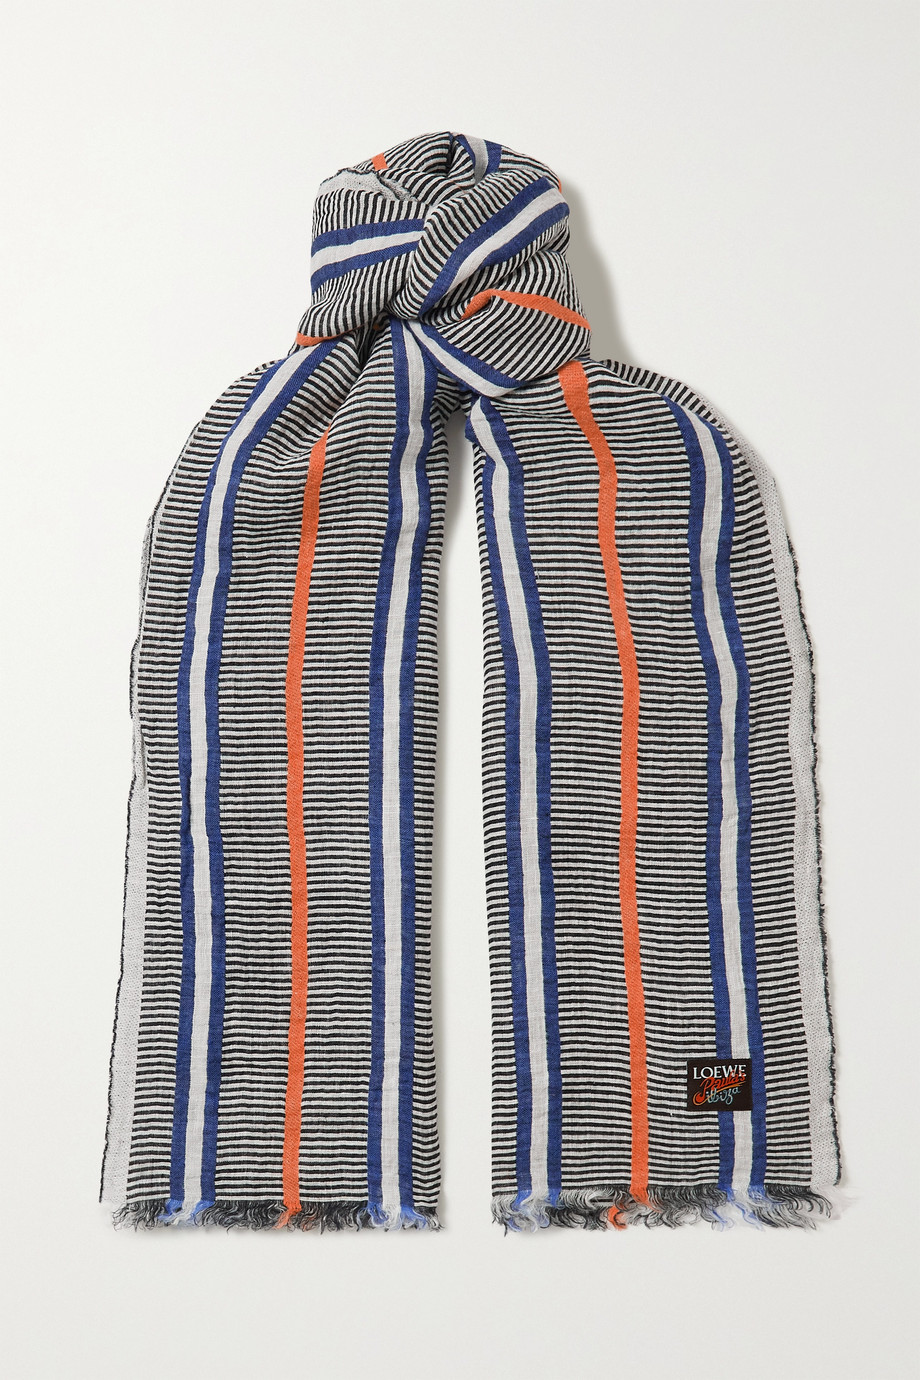 Loewe + Paula's Ibiza fringed striped linen scarf